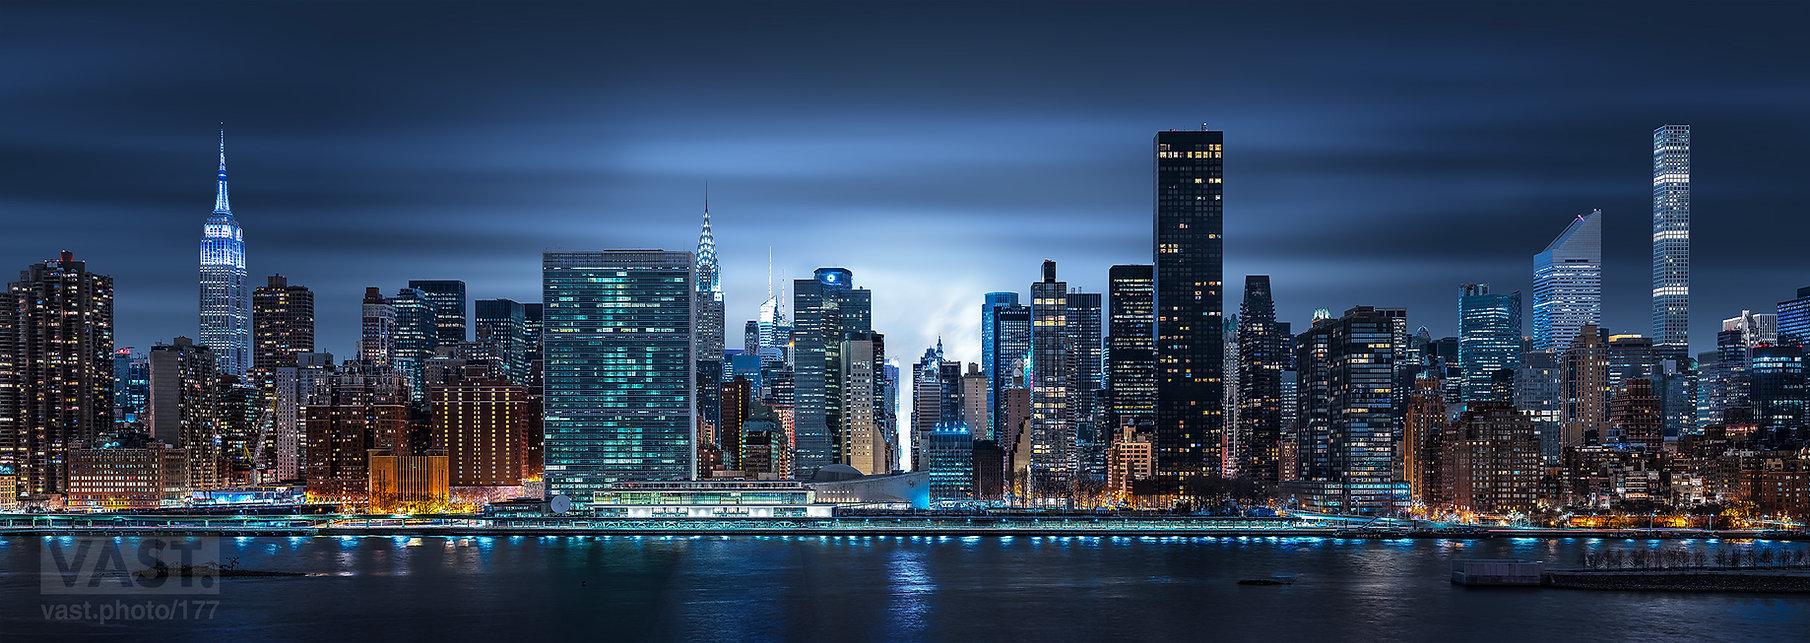 new-york-skyline-high-resolution-l.jpg